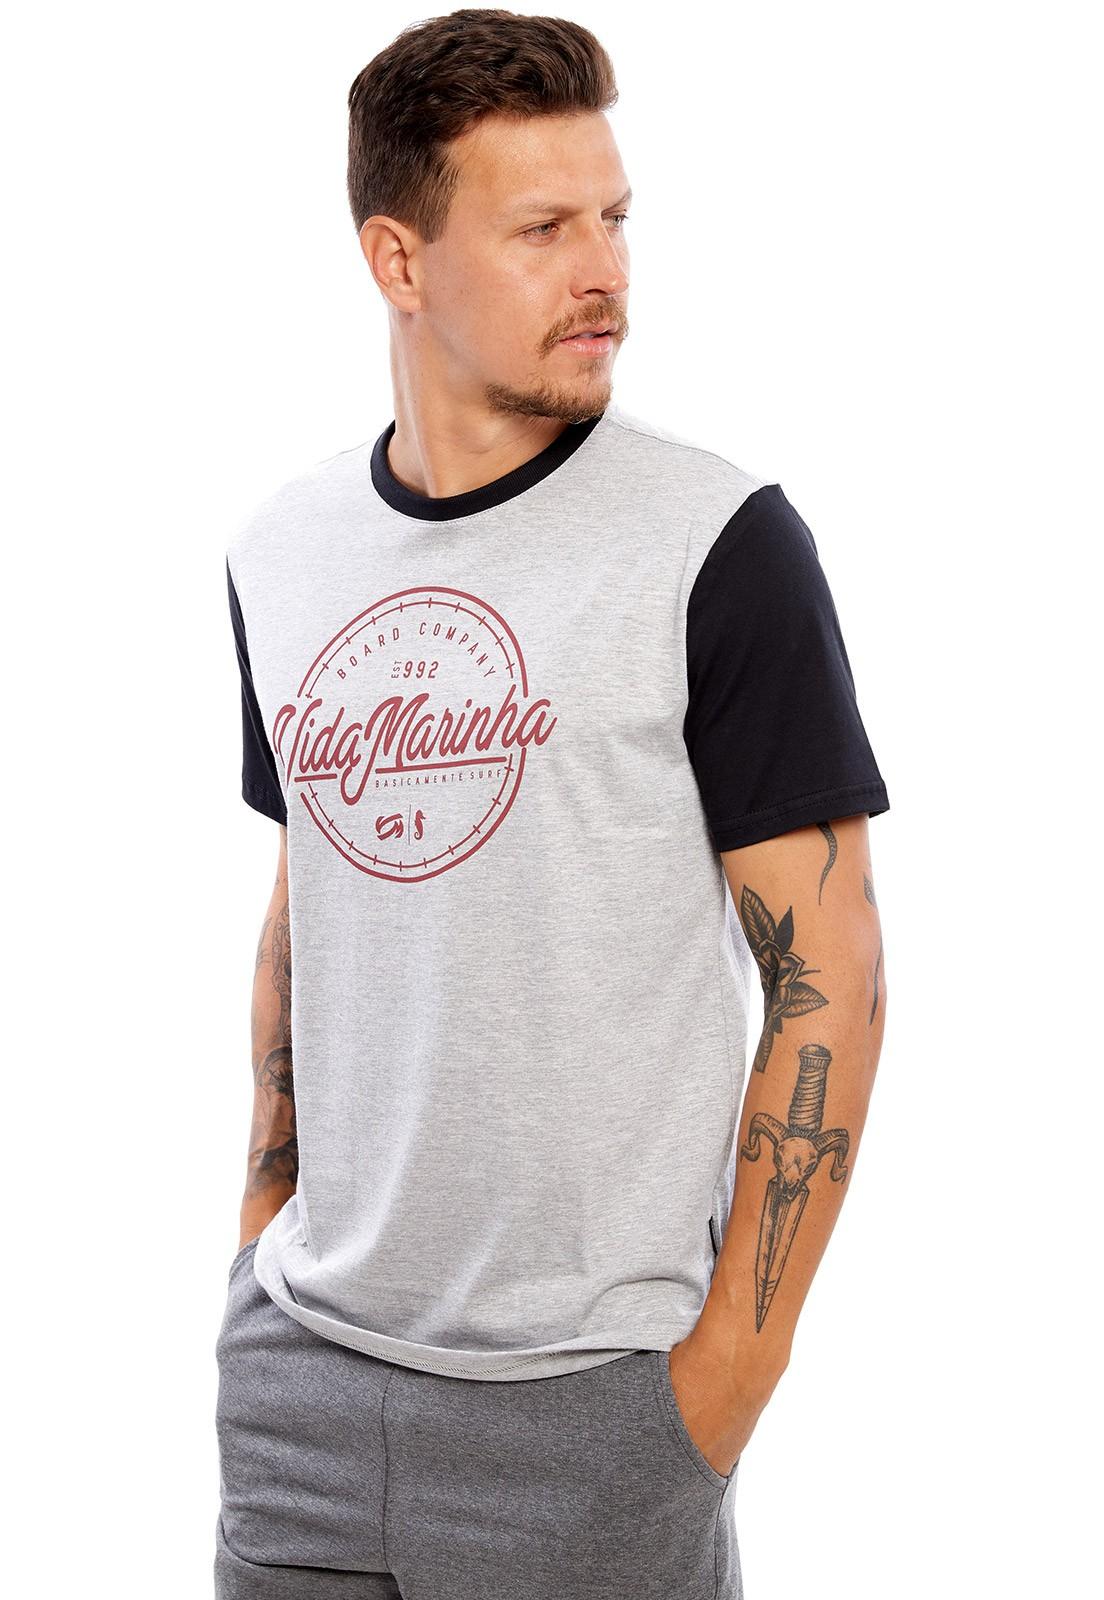 Camiseta Vida Marinha Manga Curta Cinza/Preto